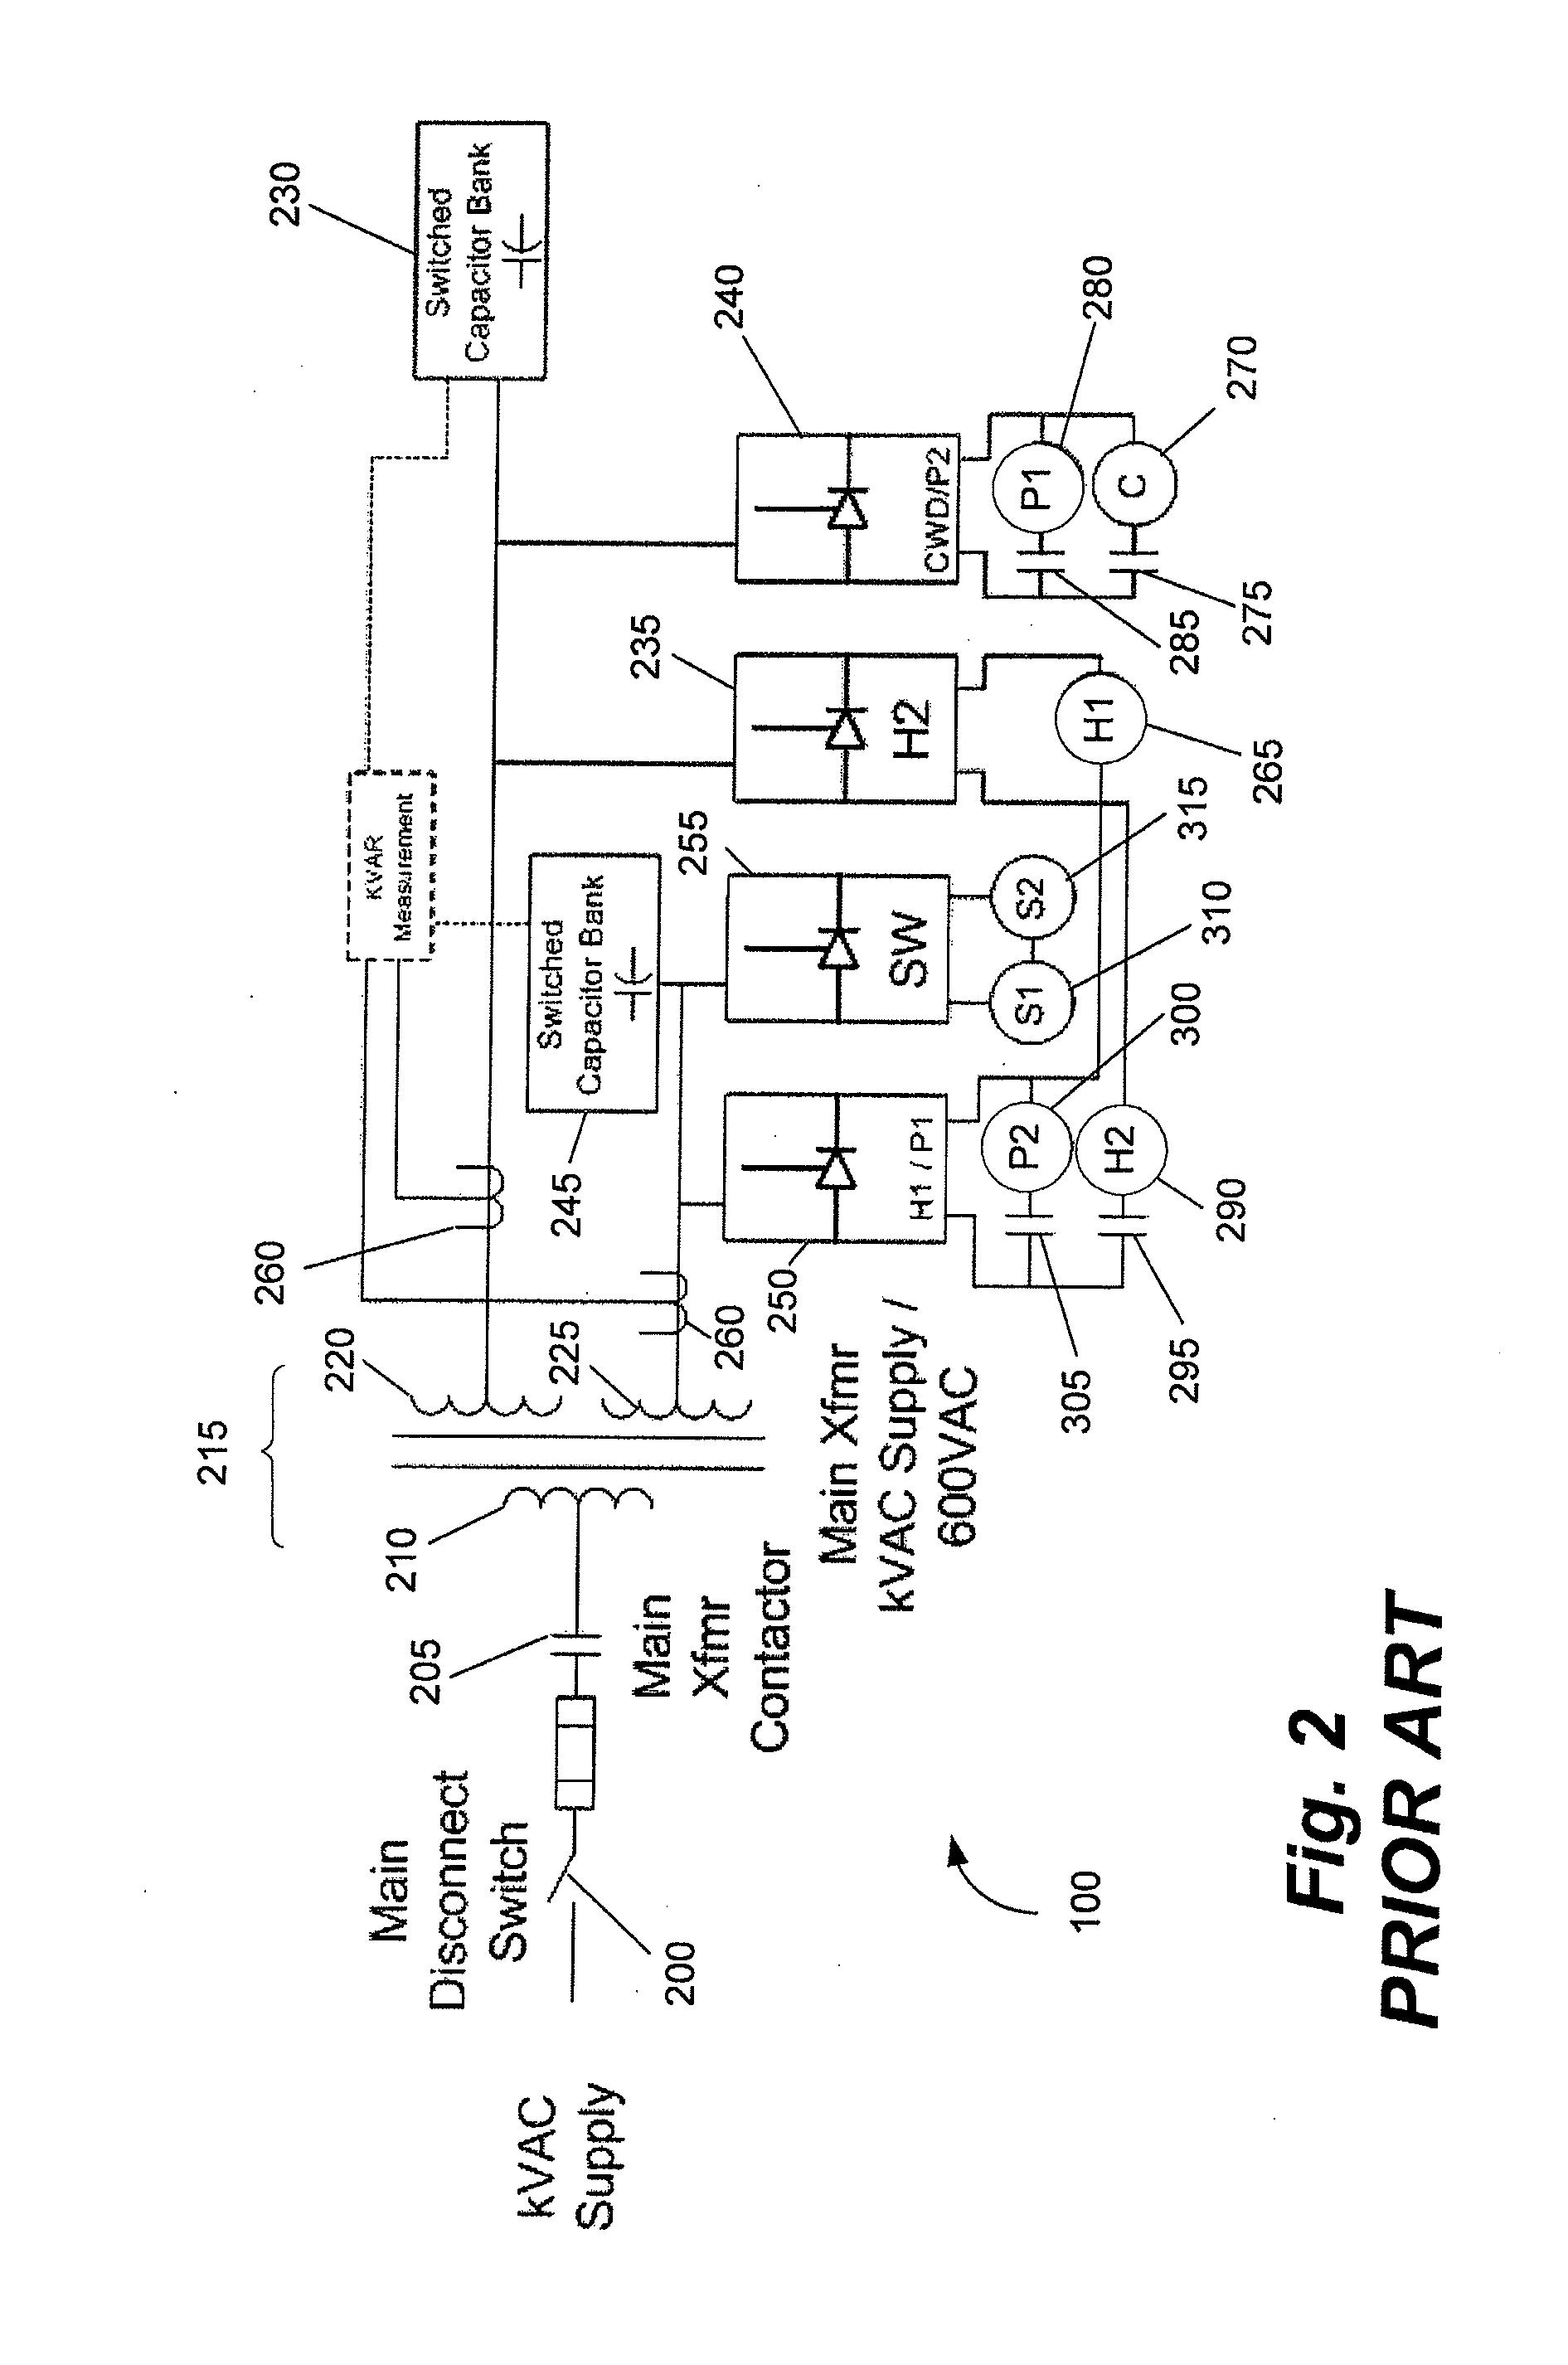 patent us hybrid electric shovel patents patent drawing